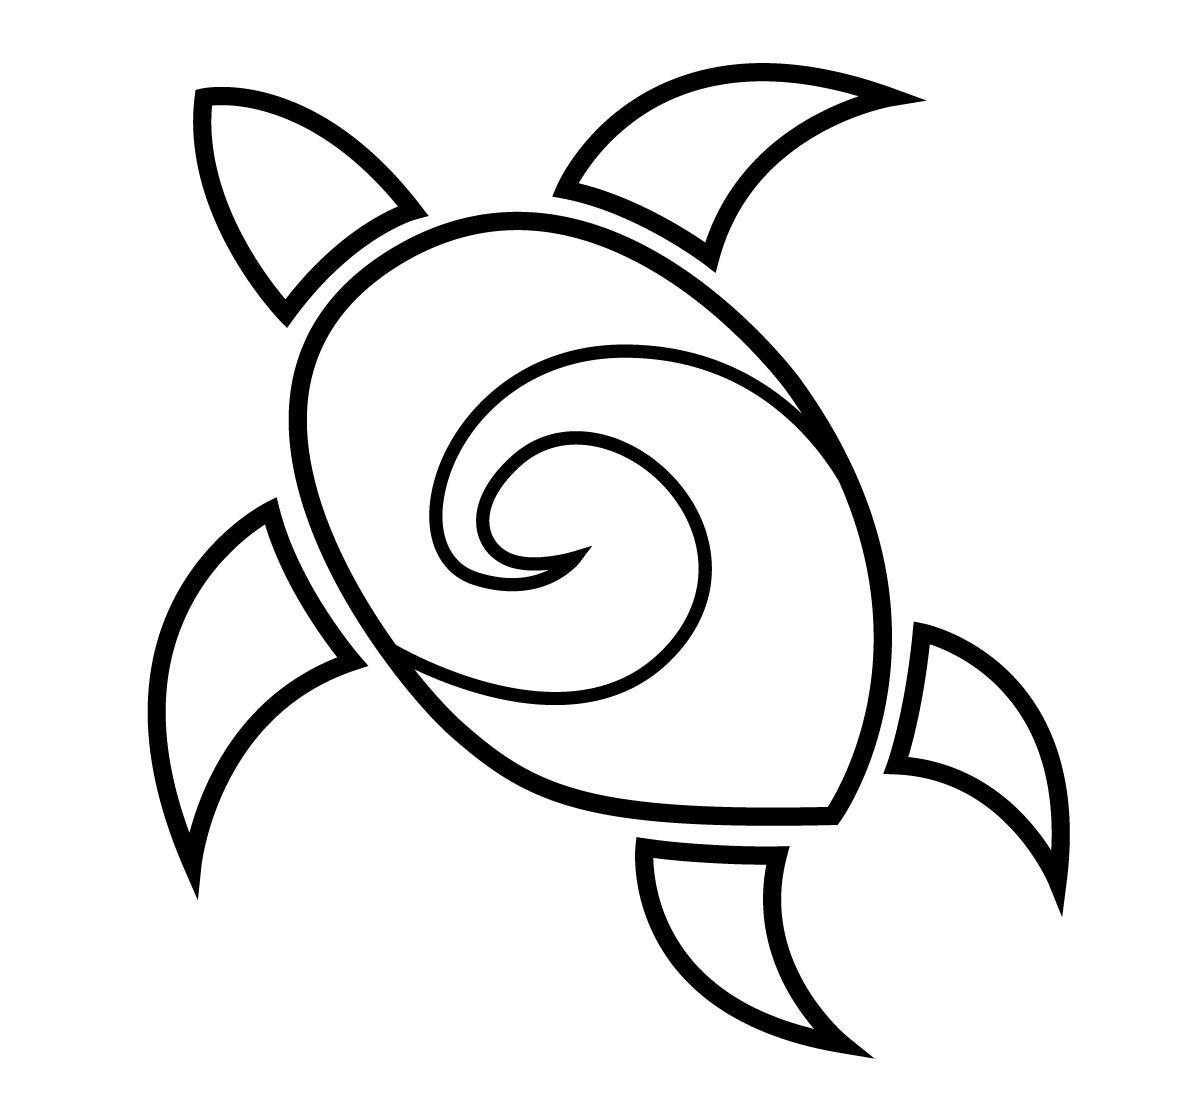 1188x1109 Animated Turtle Clip Art Simple Turtle Drawing Ideas